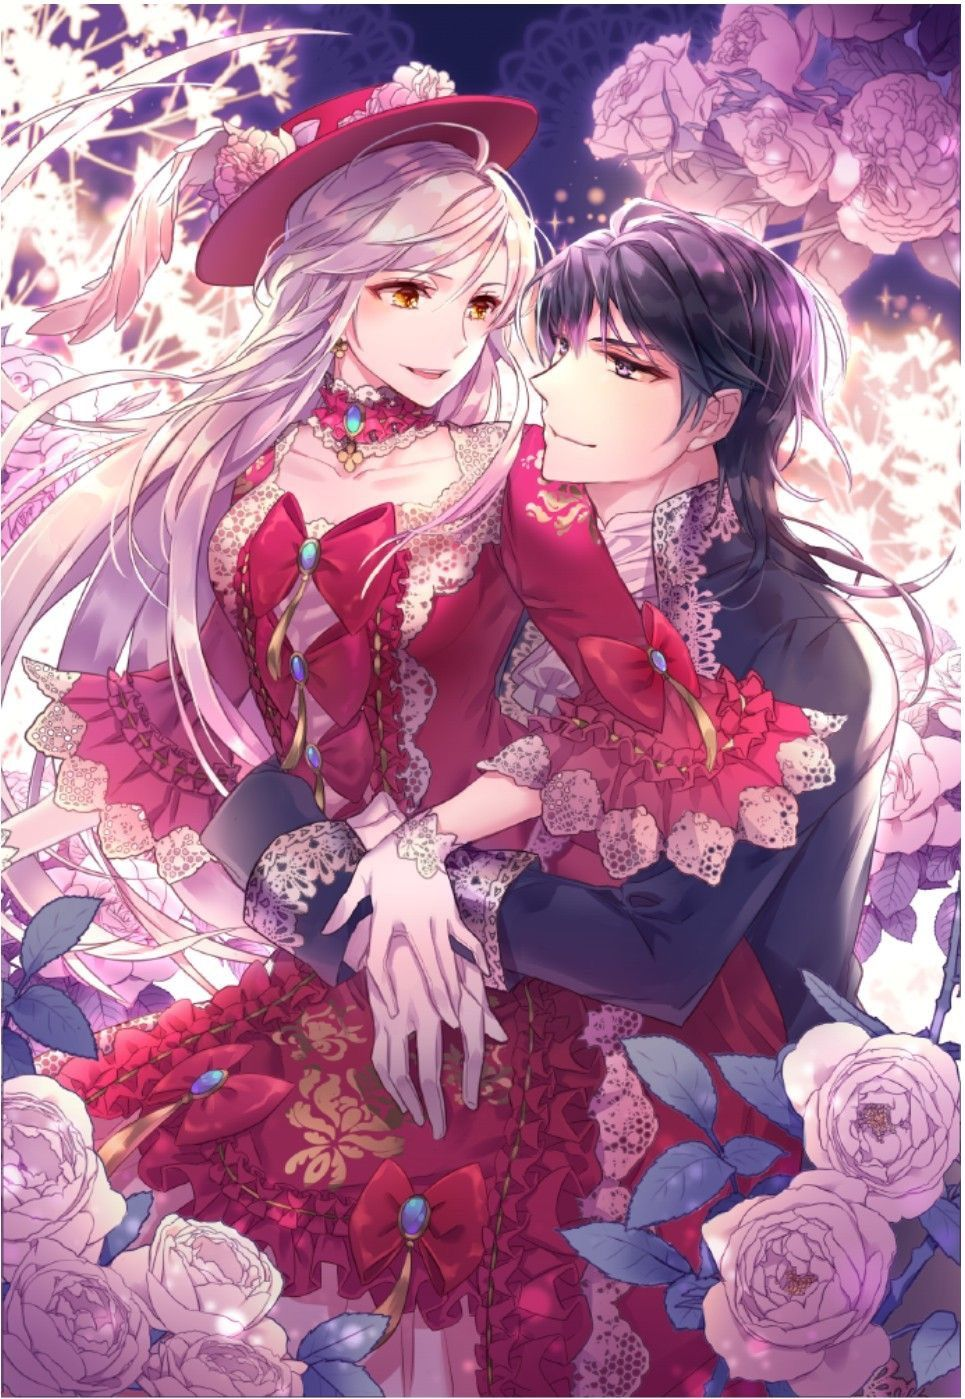 Pin von Himikºchan auf Cute Anime Couple Anime paare